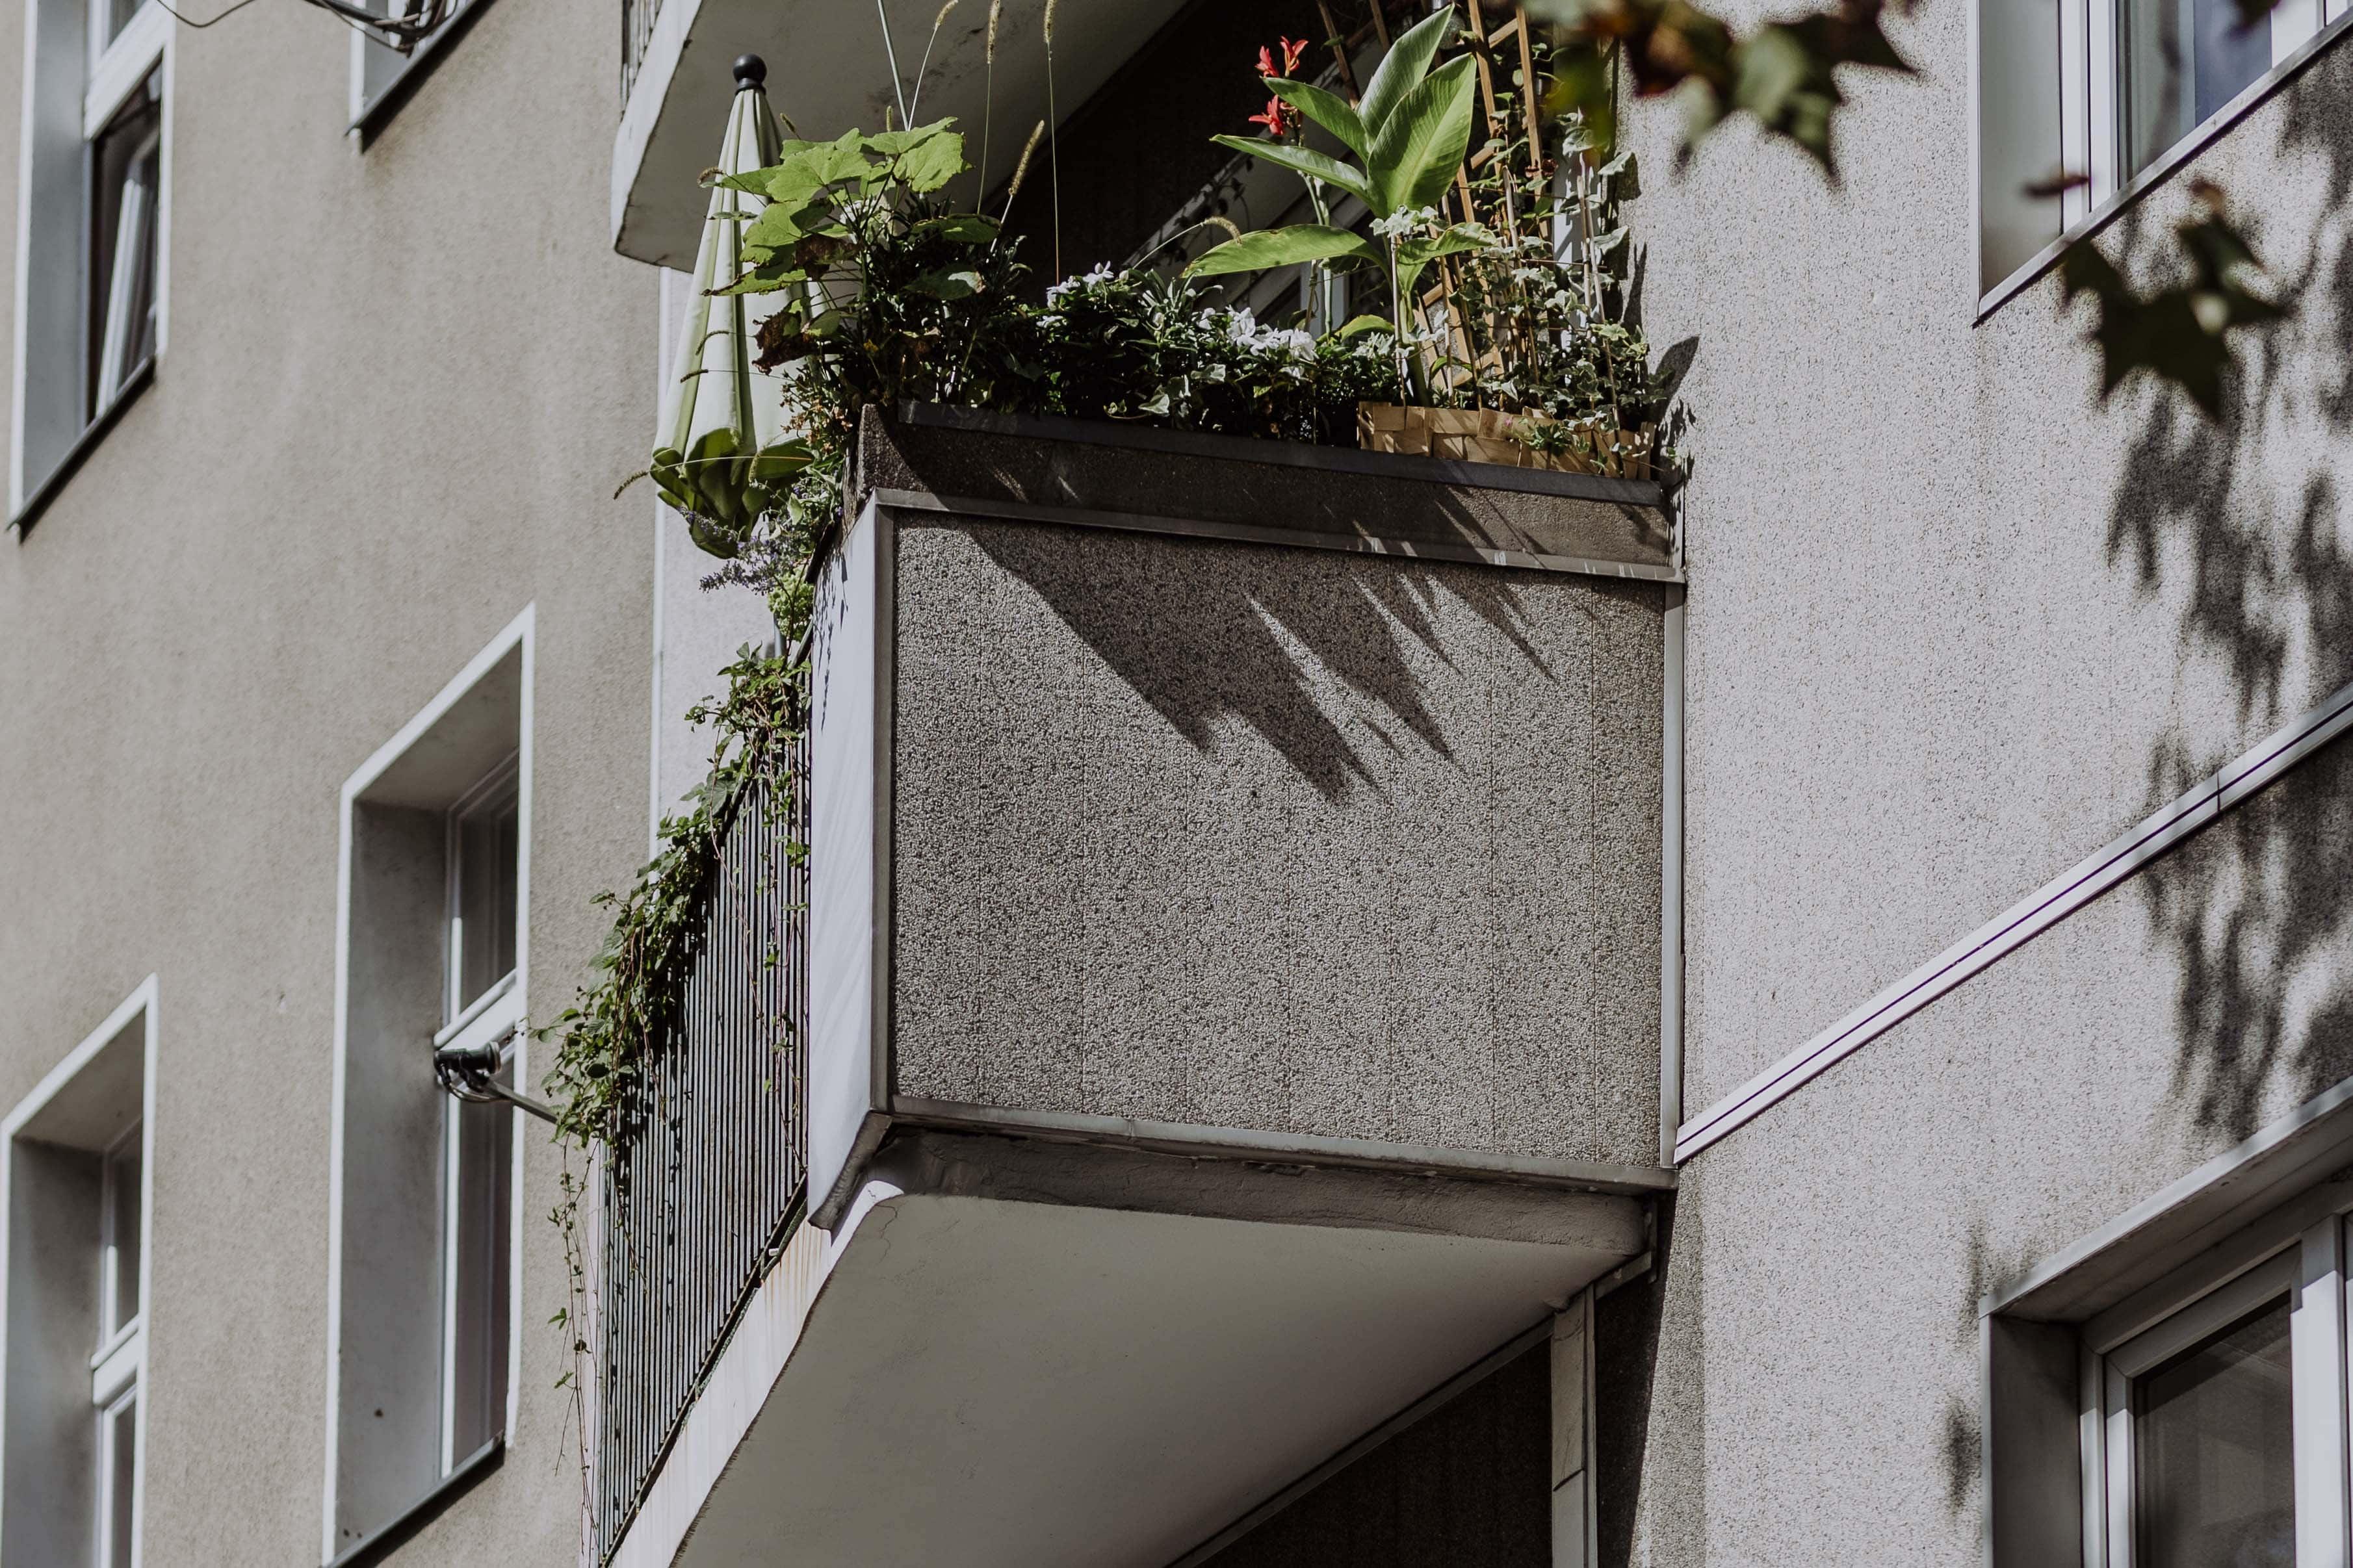 Balkon an dem Mehrfamilienhaus in Berlin